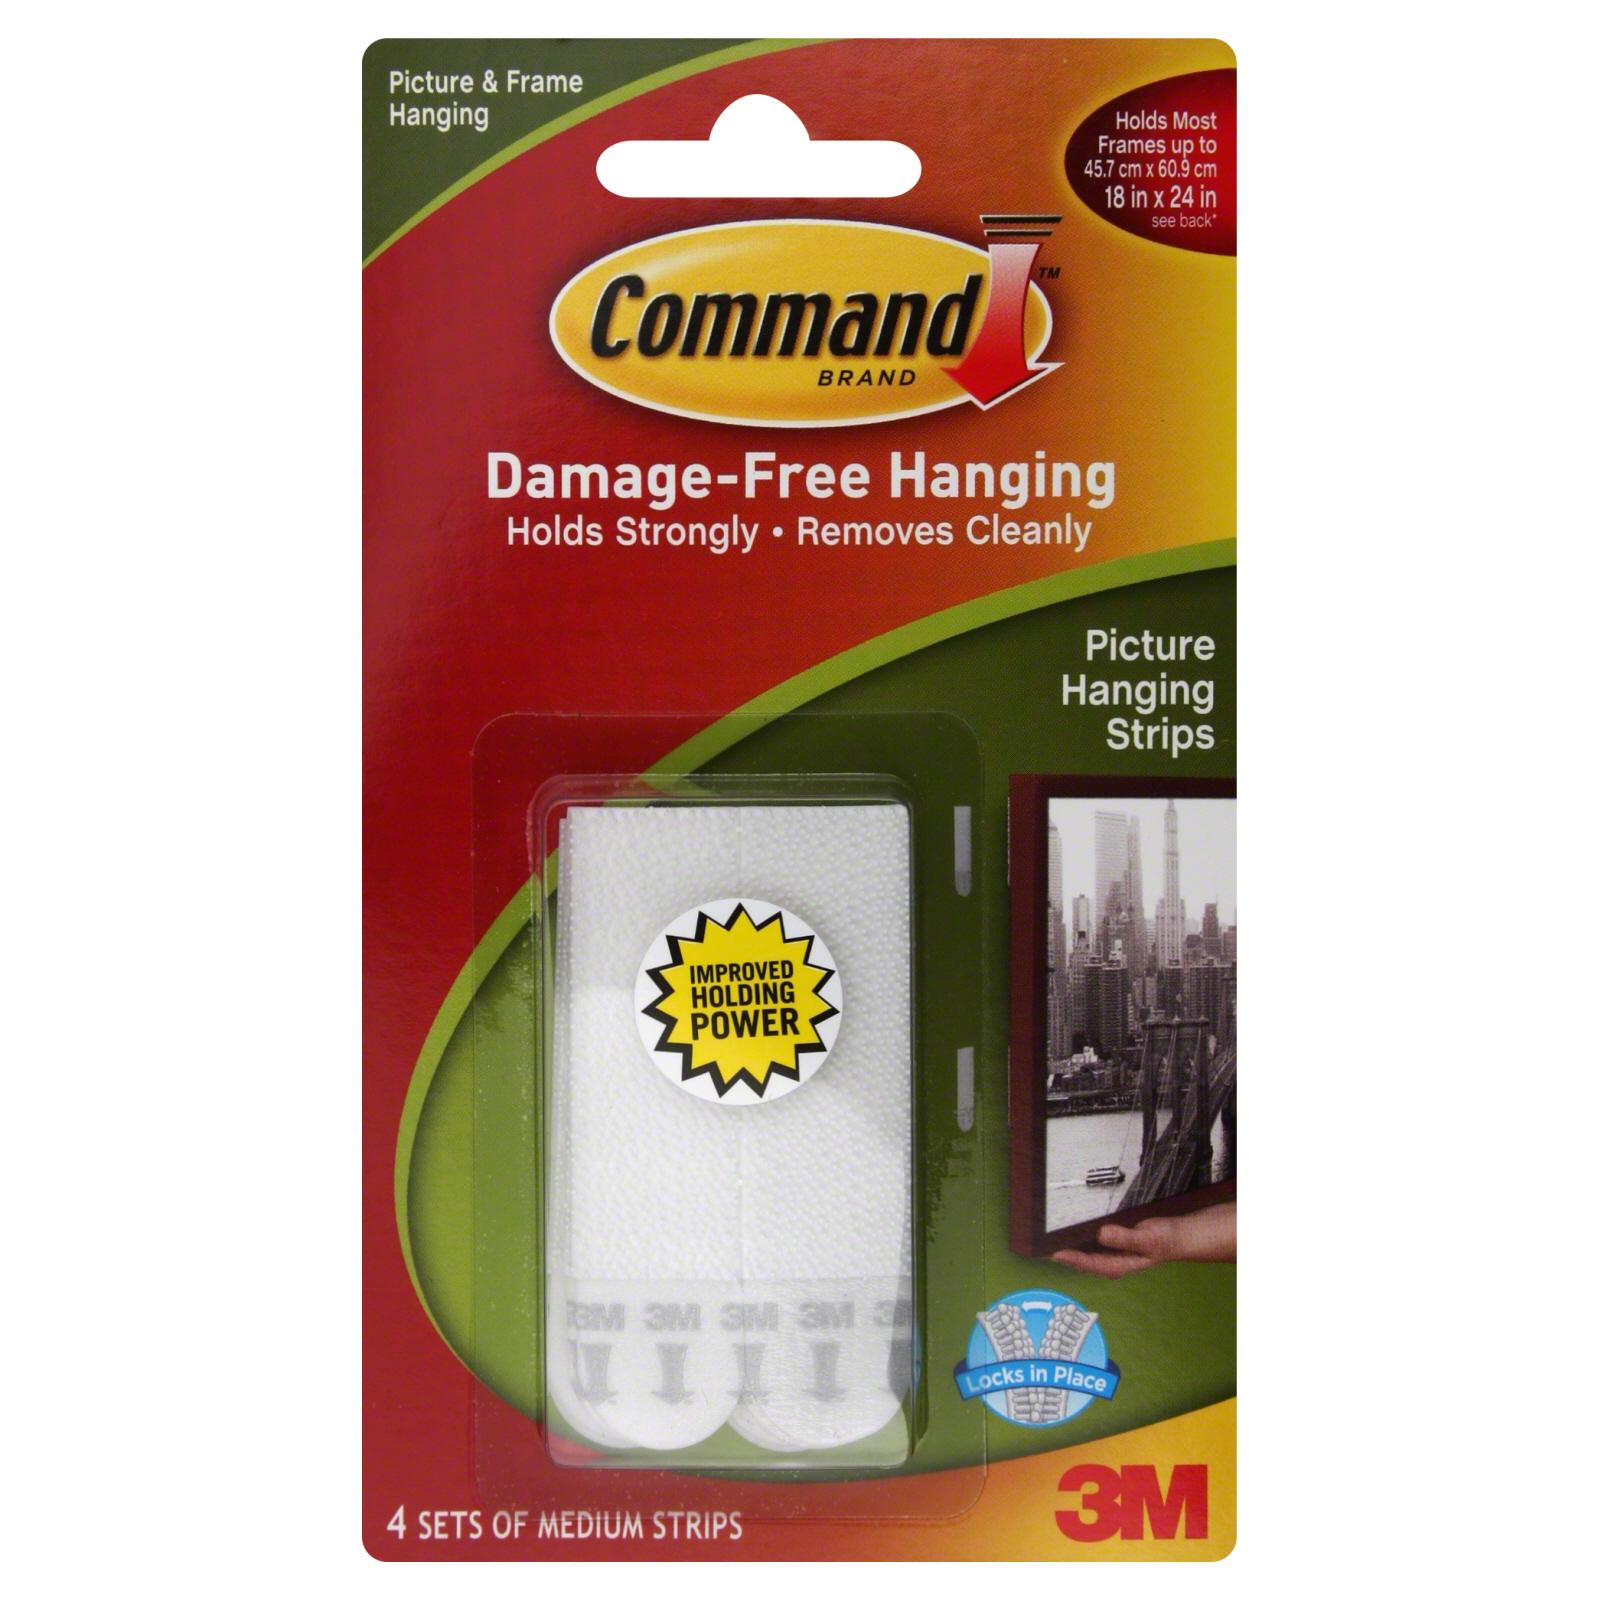 scotch command damage free picture hanging strips 3 sets. Black Bedroom Furniture Sets. Home Design Ideas